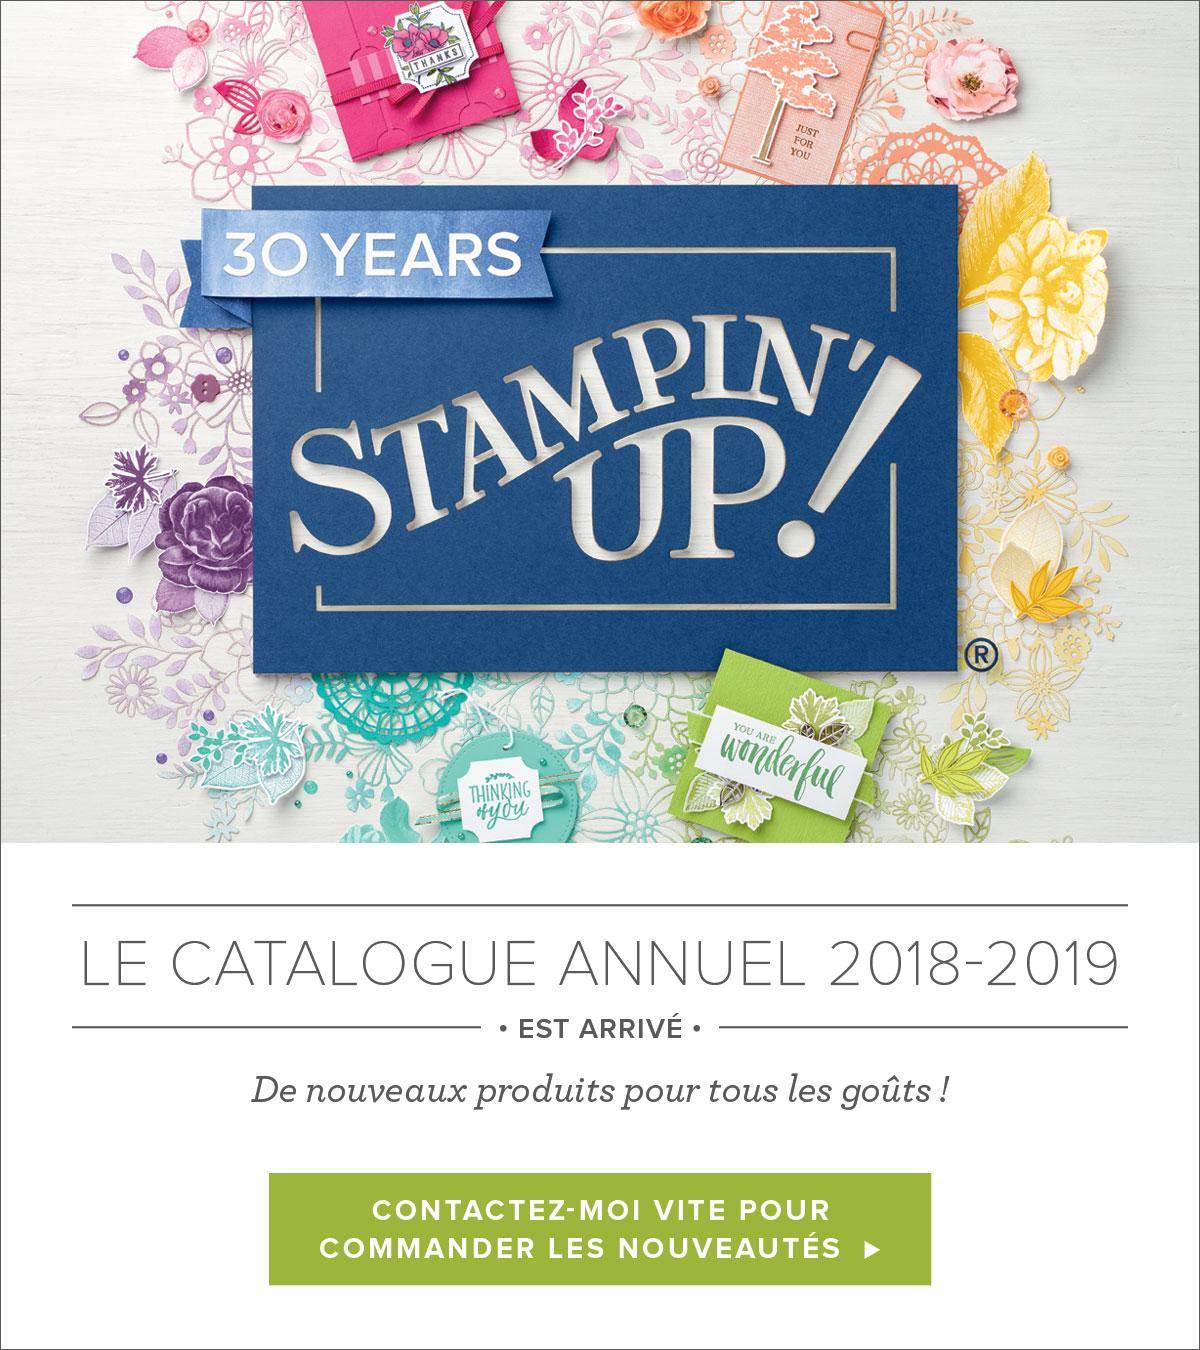 Catalogue Stampin'Up 2018 / 2019